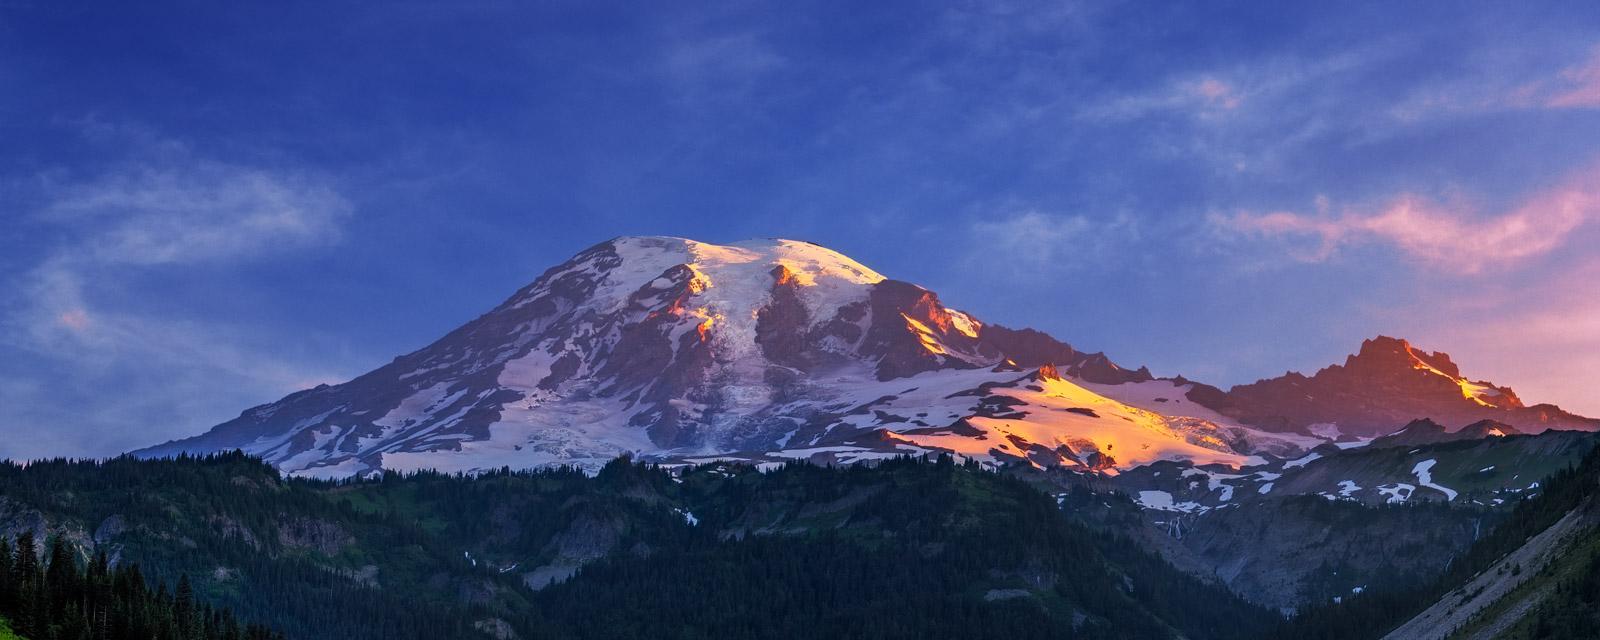 A Limited Edition, Fine Art panoramic photograph of sunrise light hitting Mount Rainier in Washington. Available as a Fine Art...